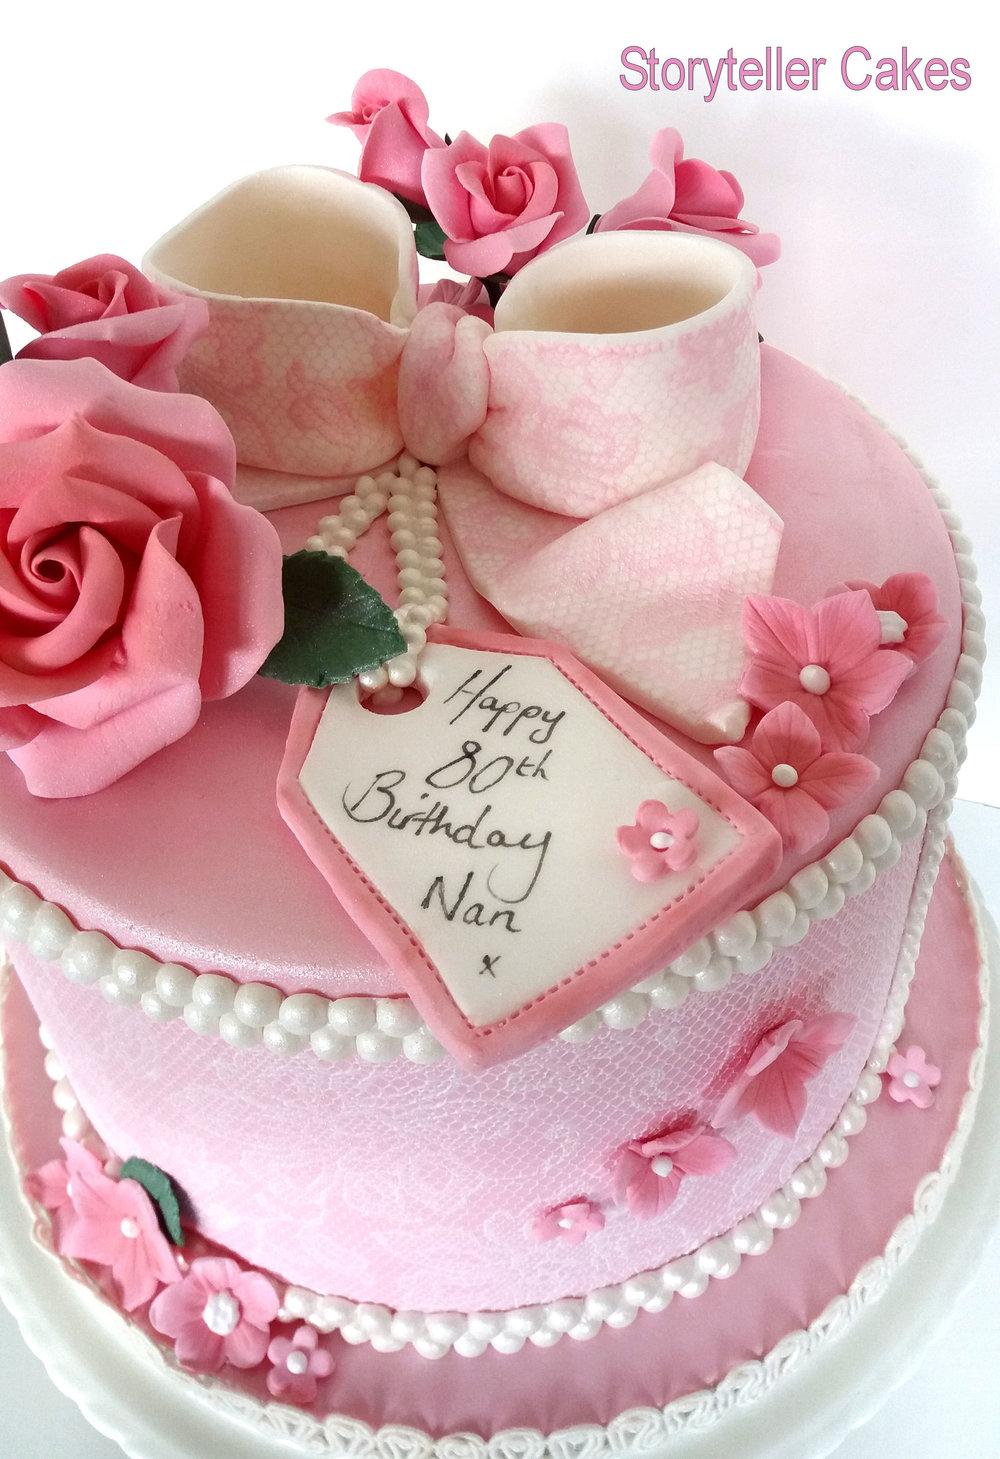 rose cake 3.jpg